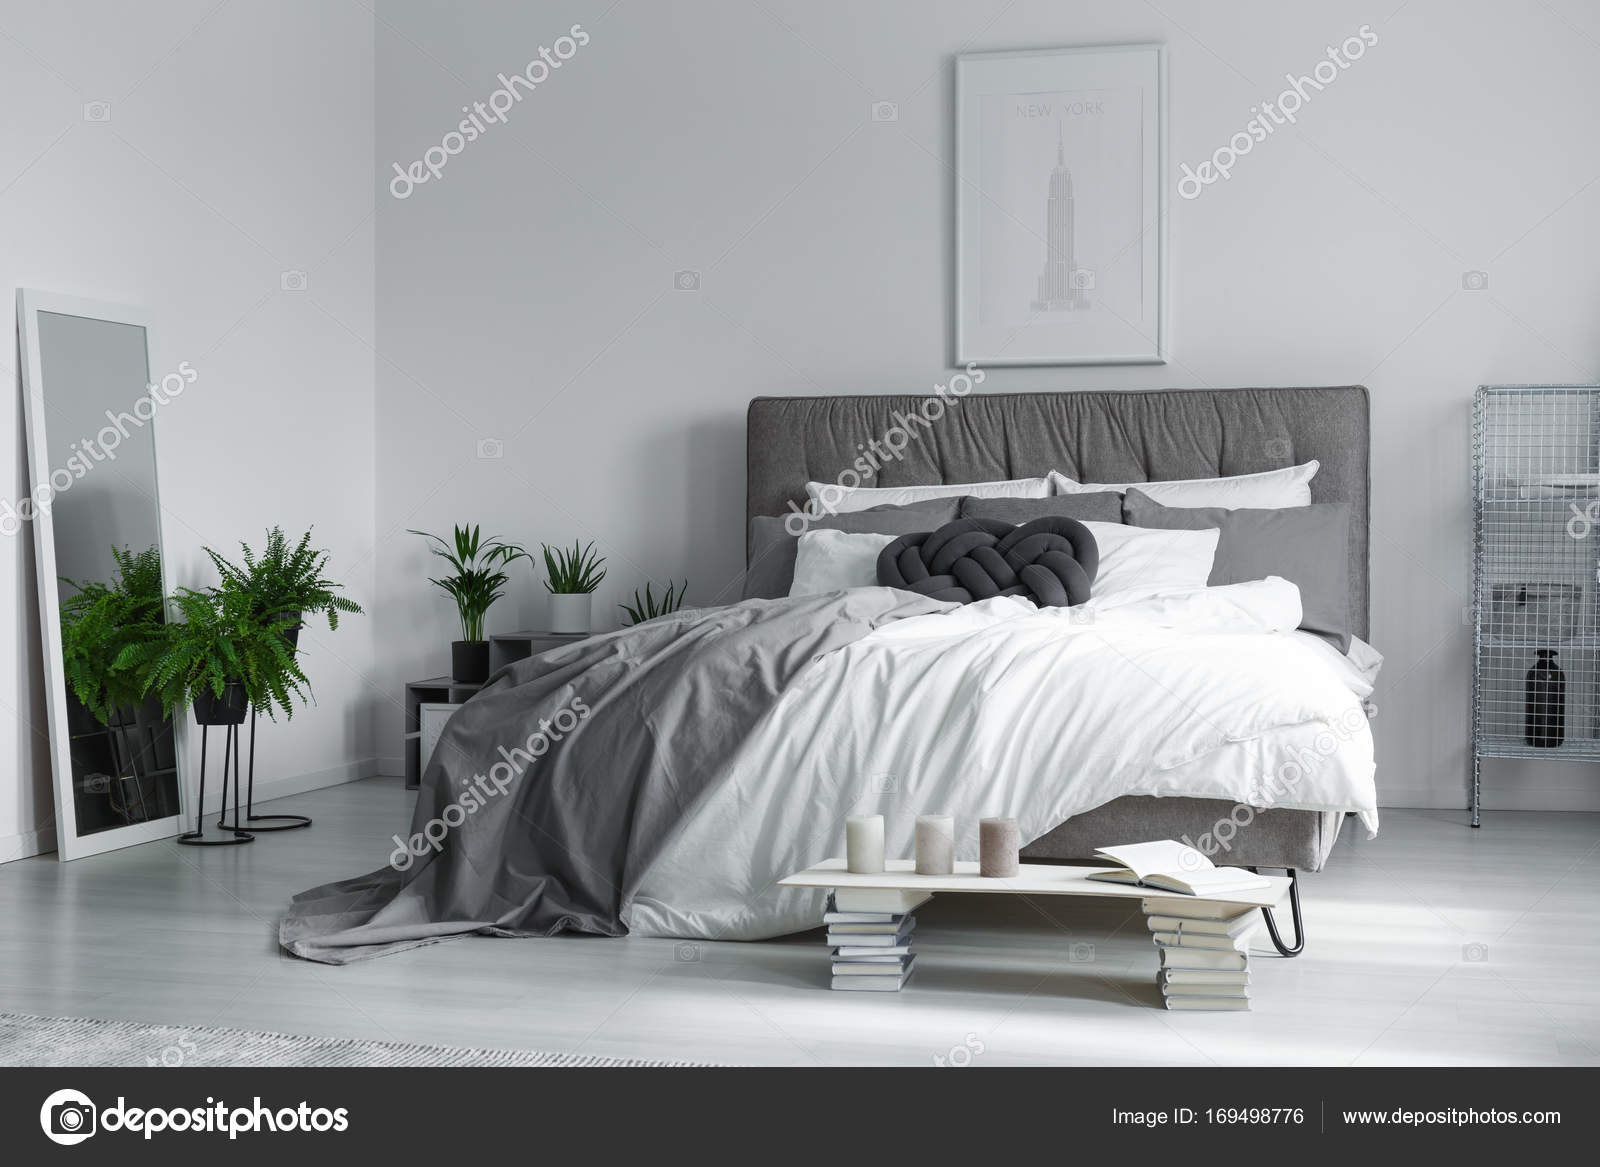 Elegant interieur van slaapkamer u stockfoto photographee